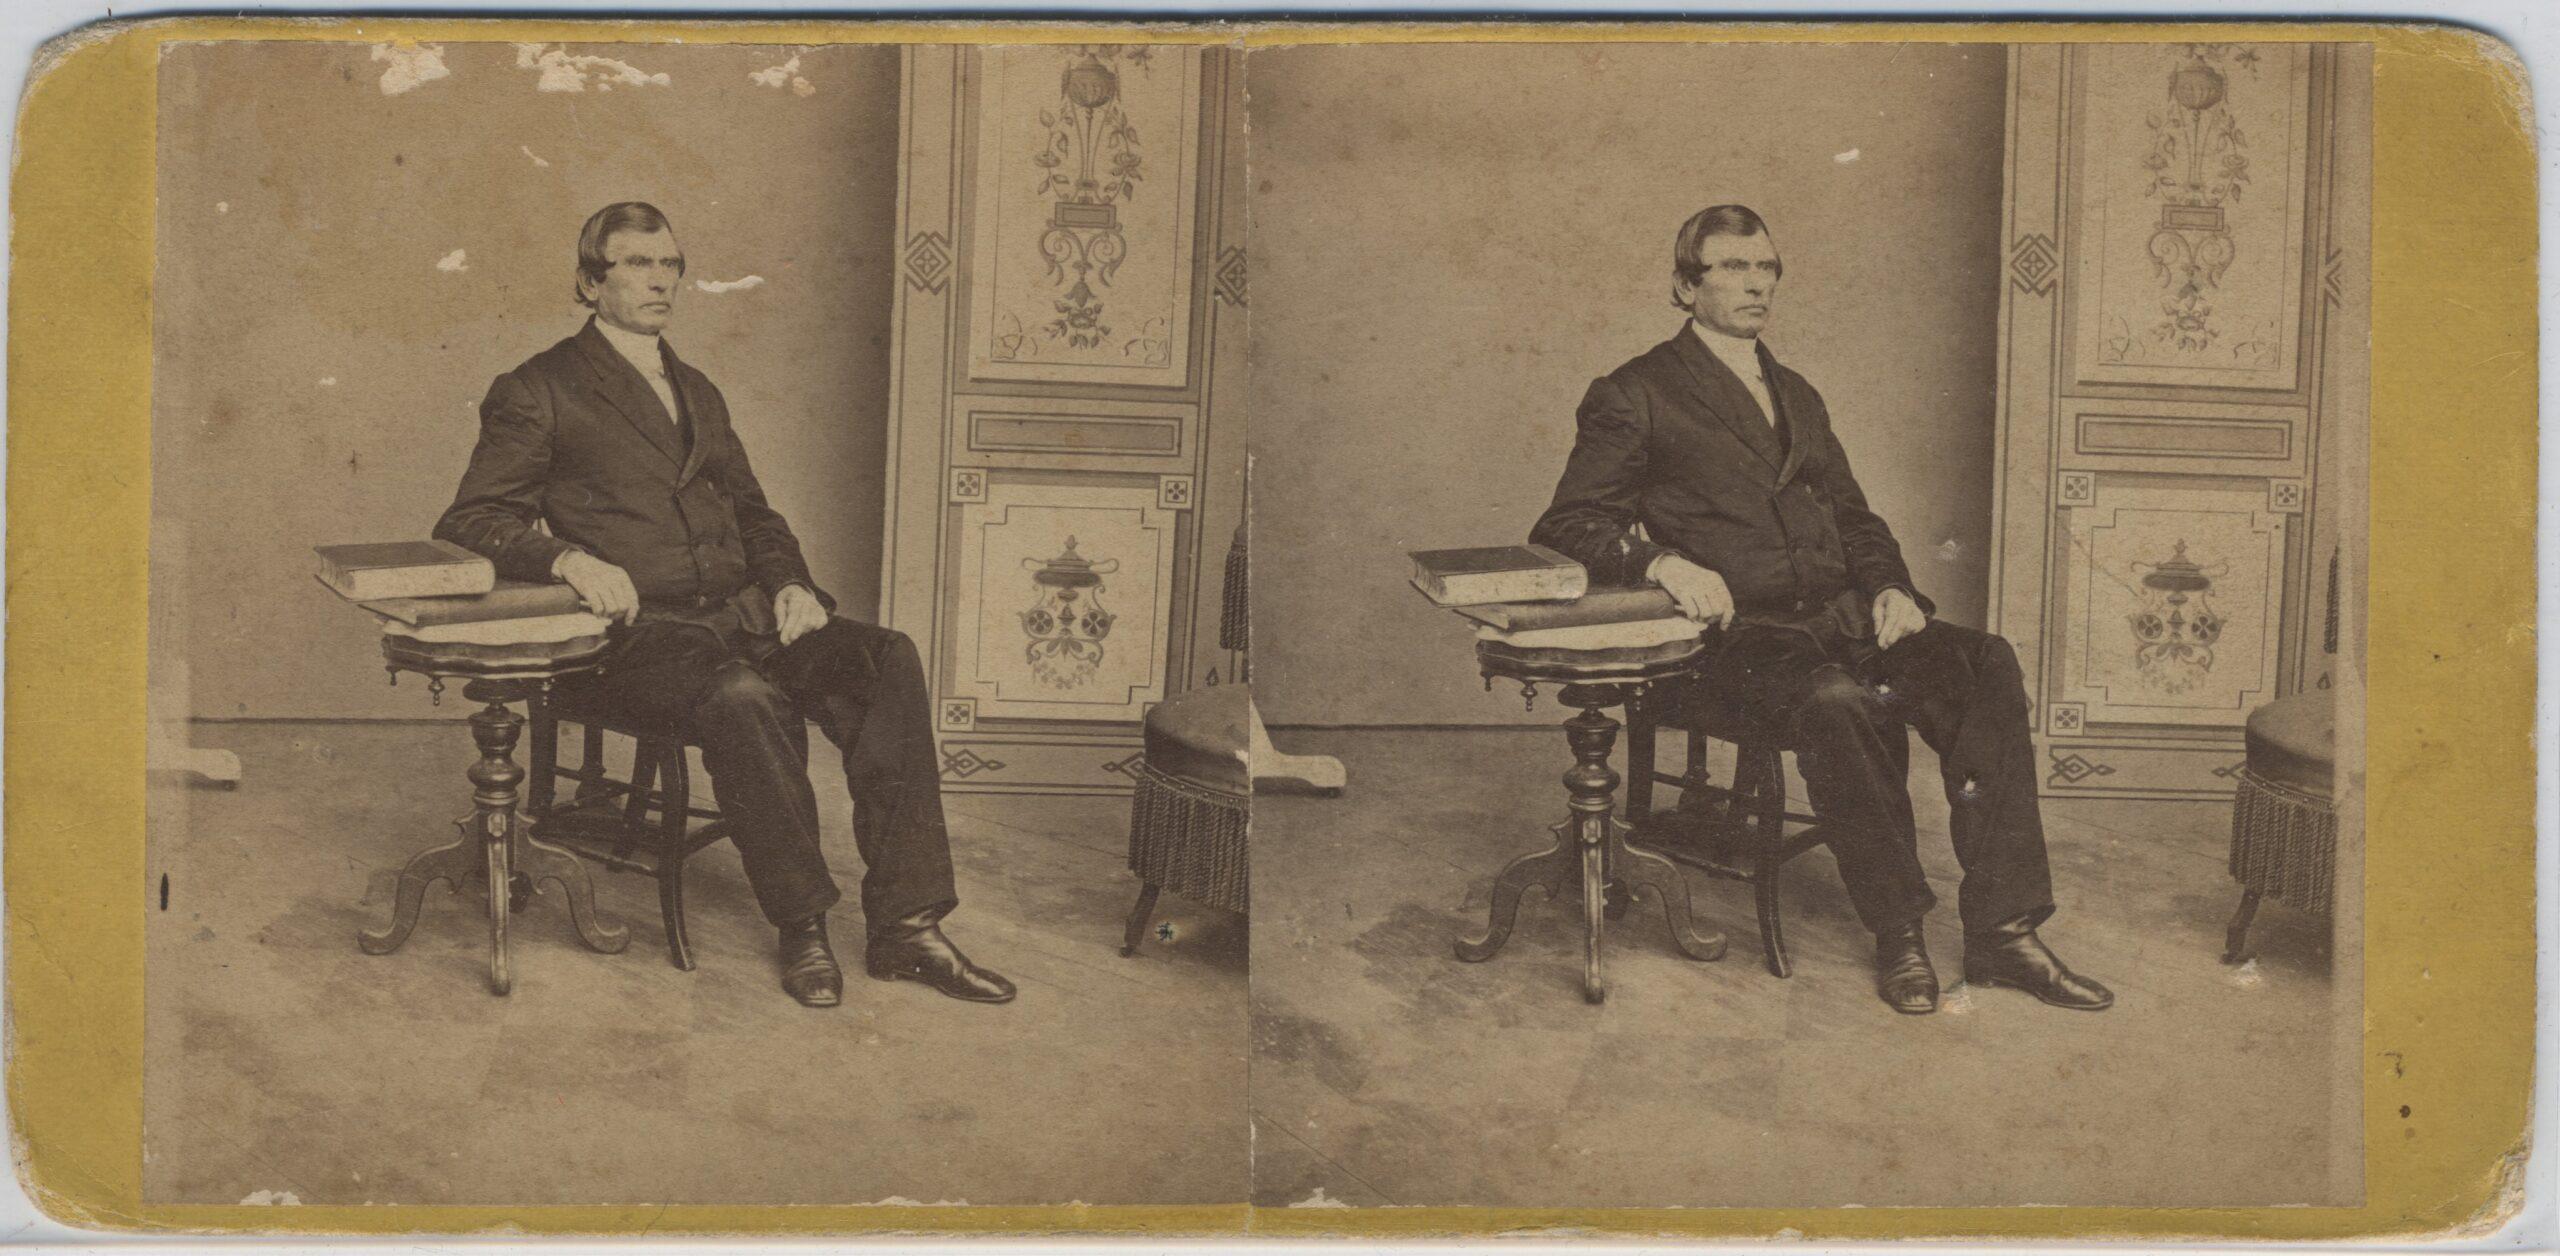 LJTP 100.249 - S. Root - Bishop Matthew Simpson - Sept 16 1868